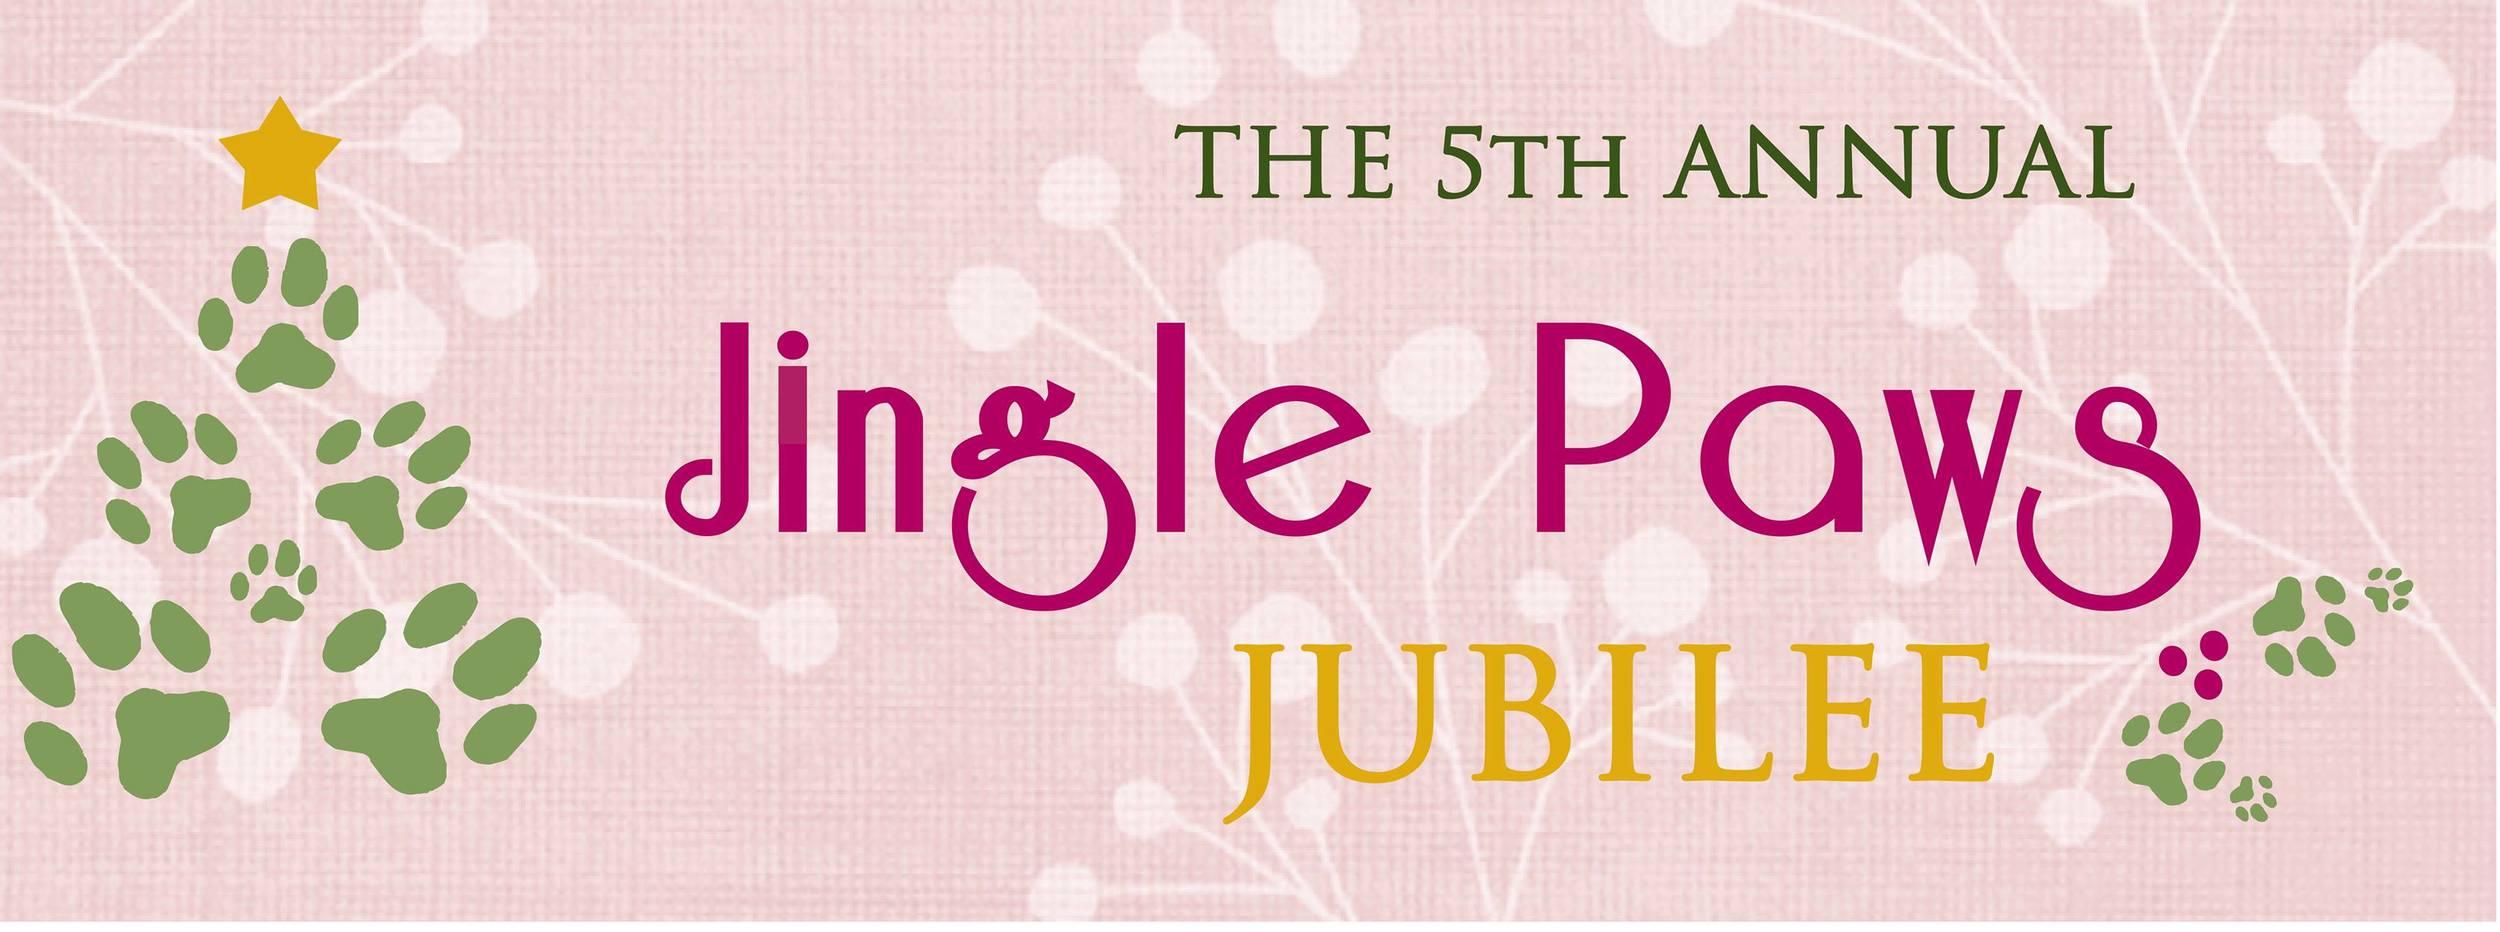 jingle-paws-jubilee.jpg